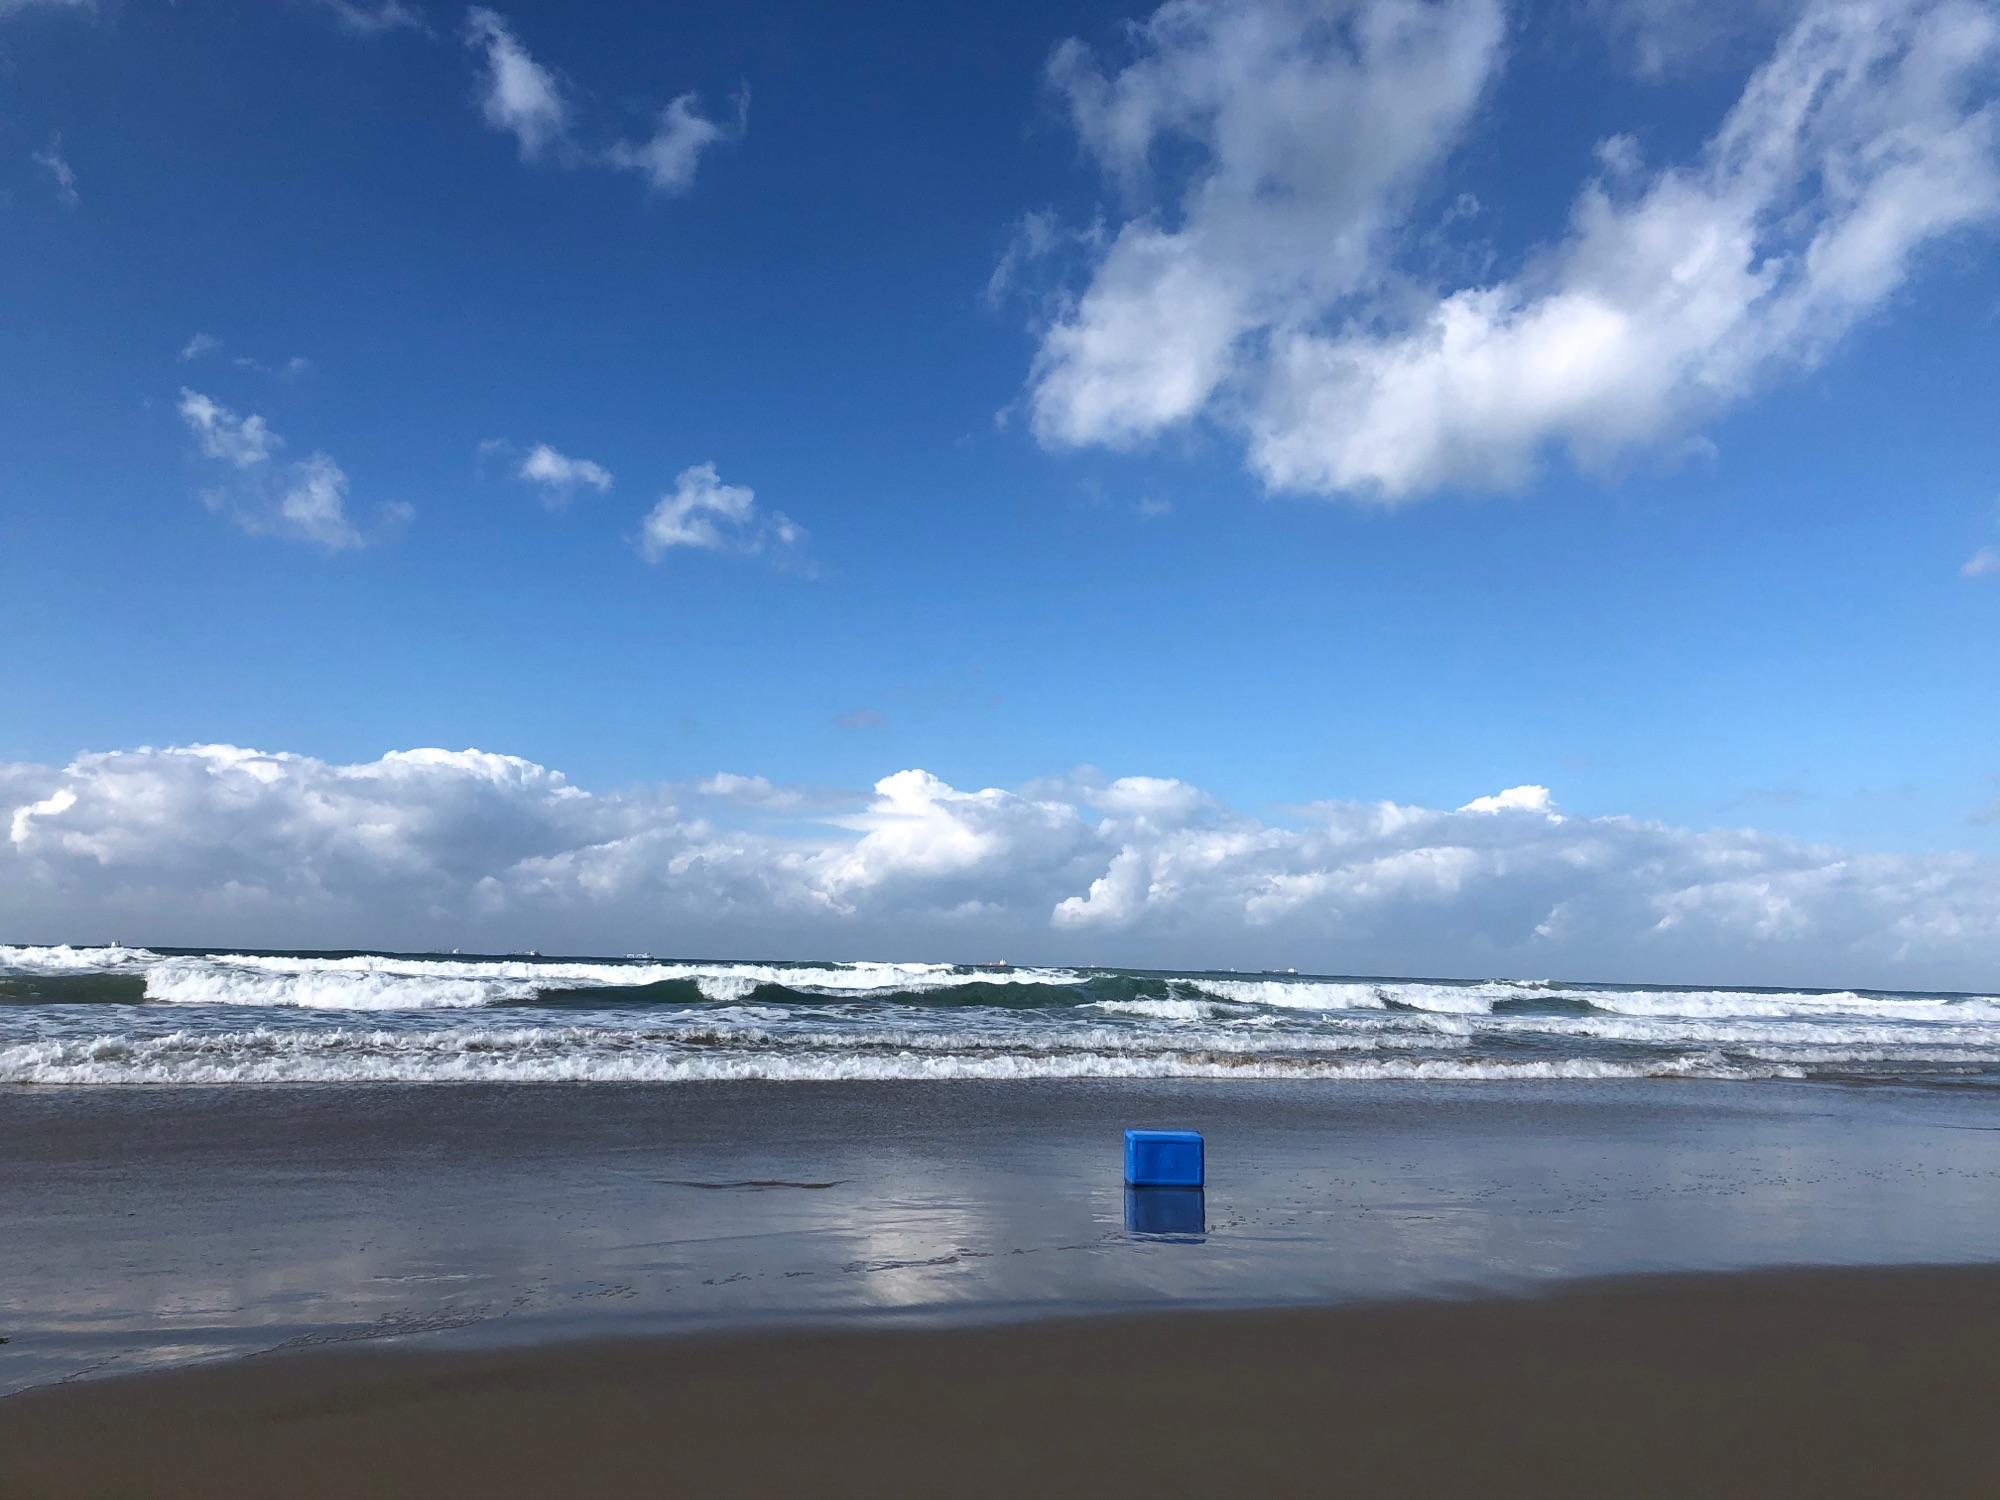 Истории про синий кубик помните?